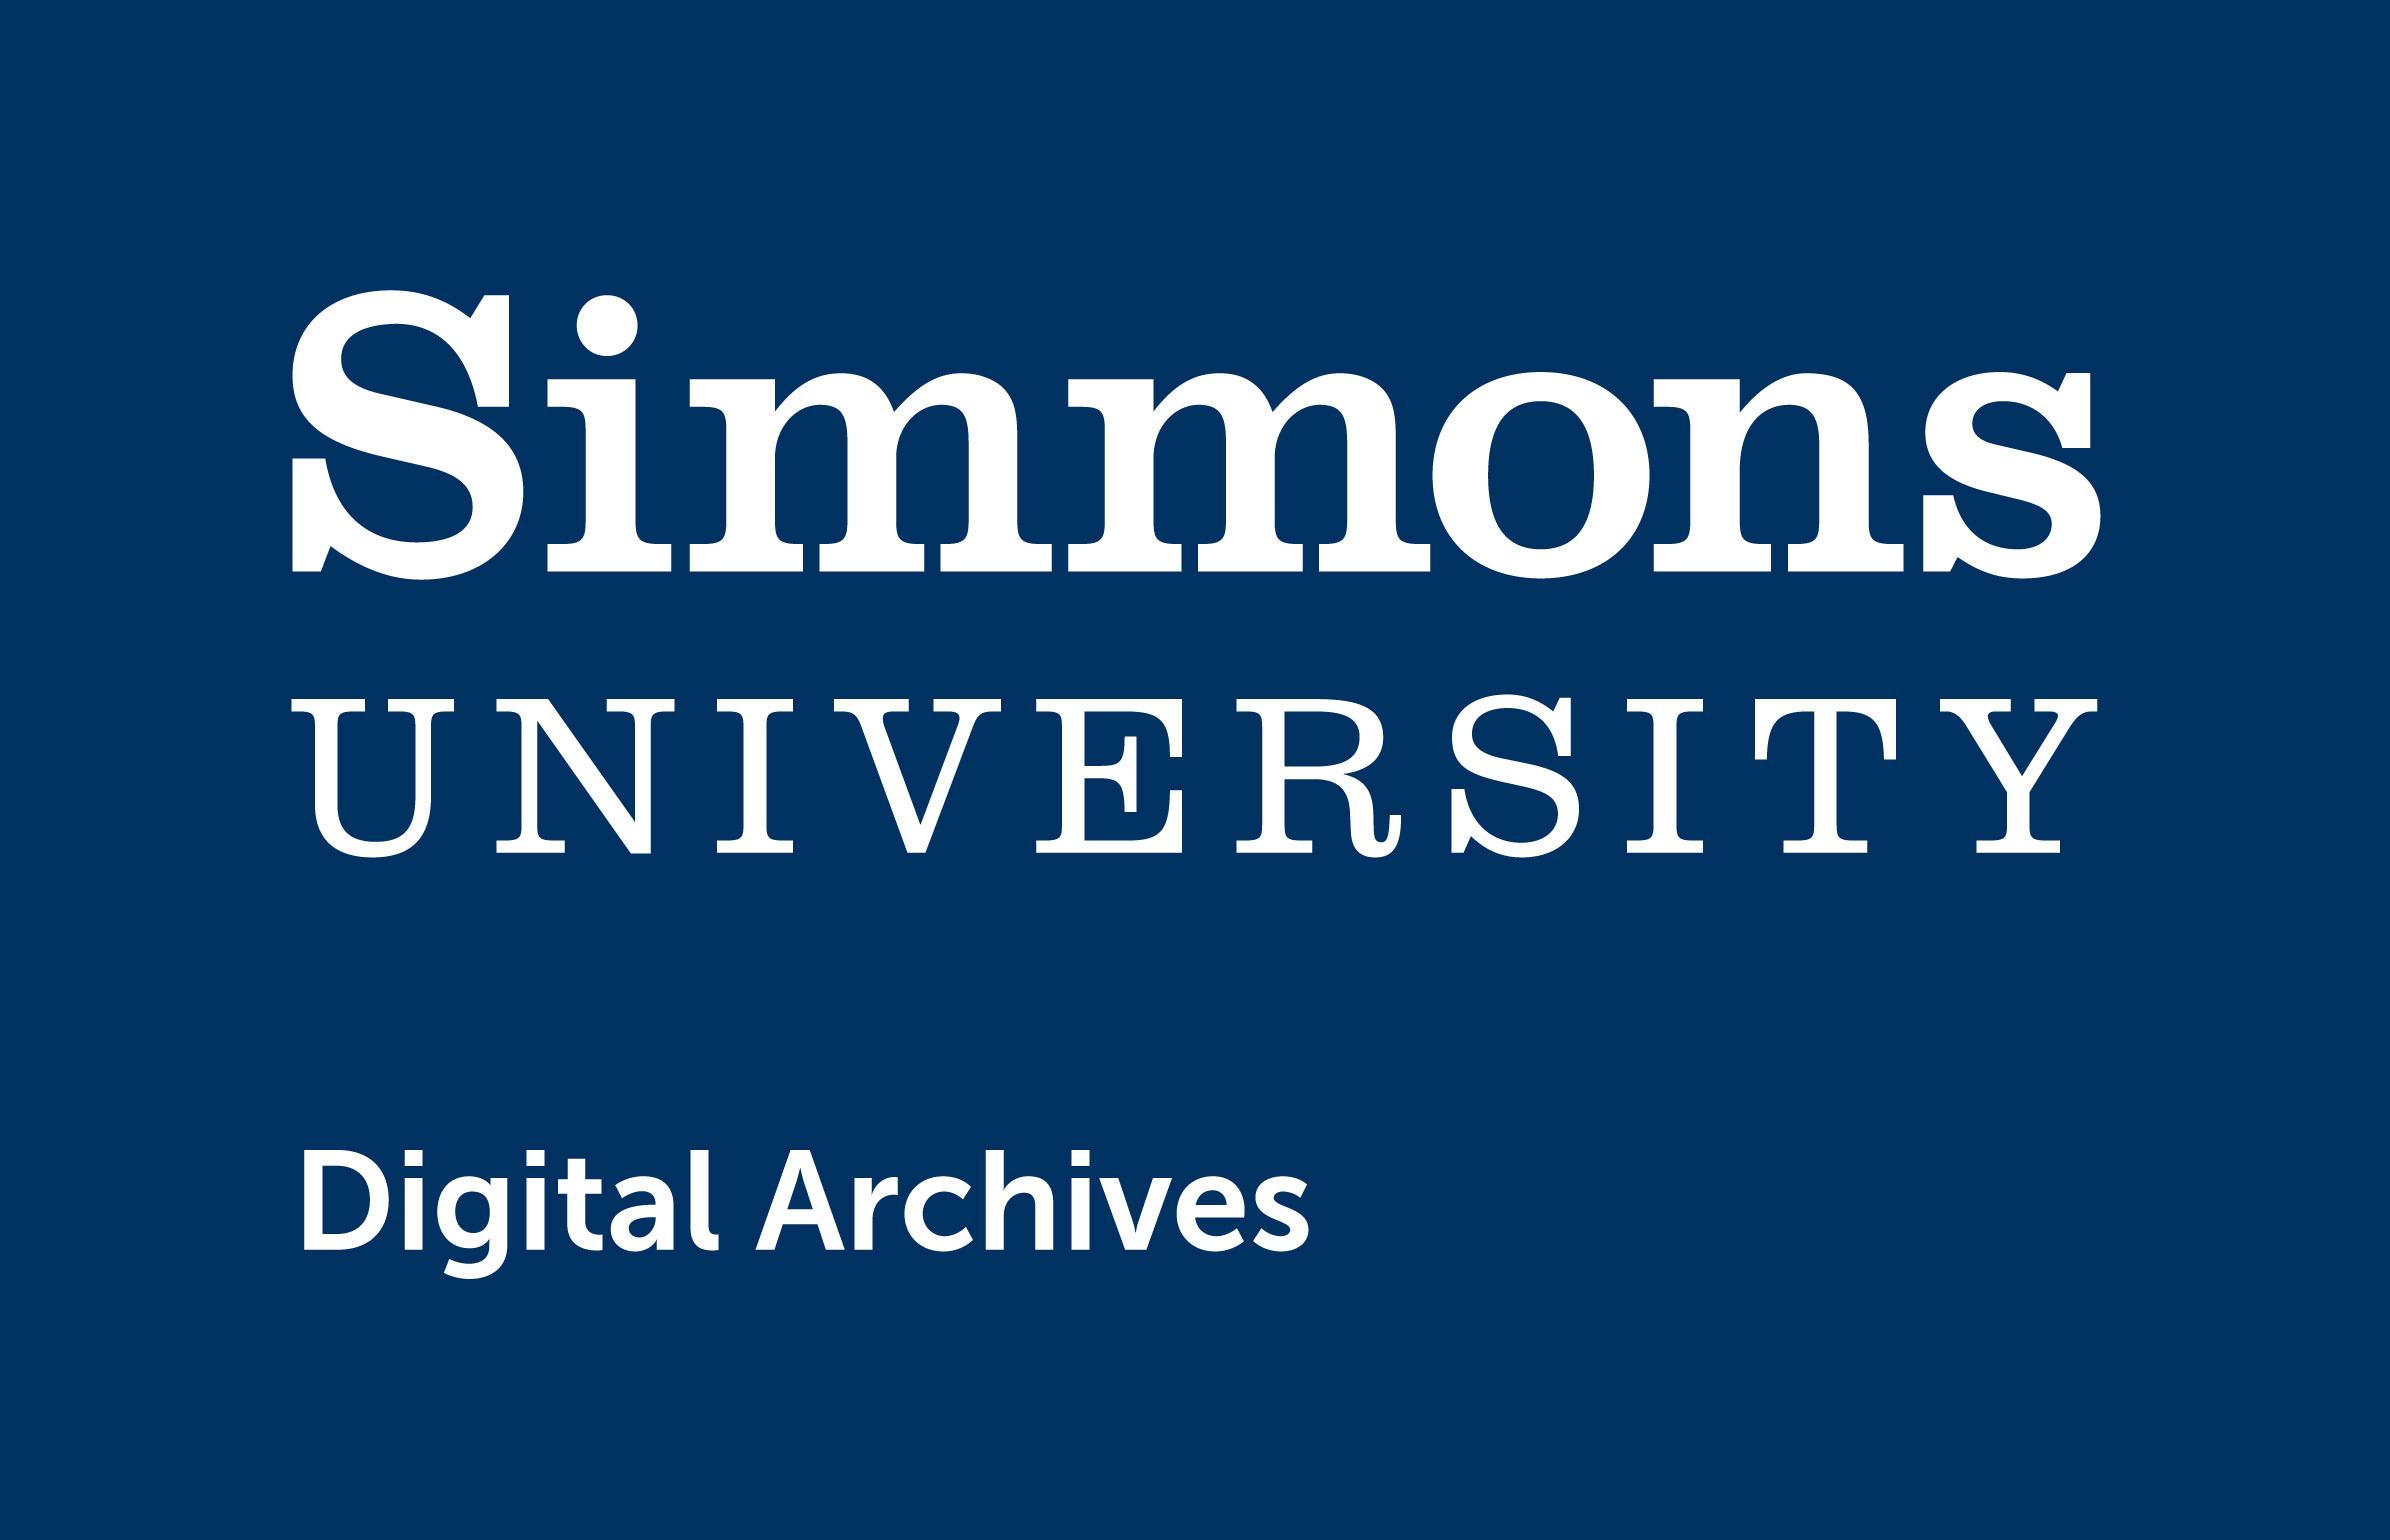 Simmons University Digital Archives